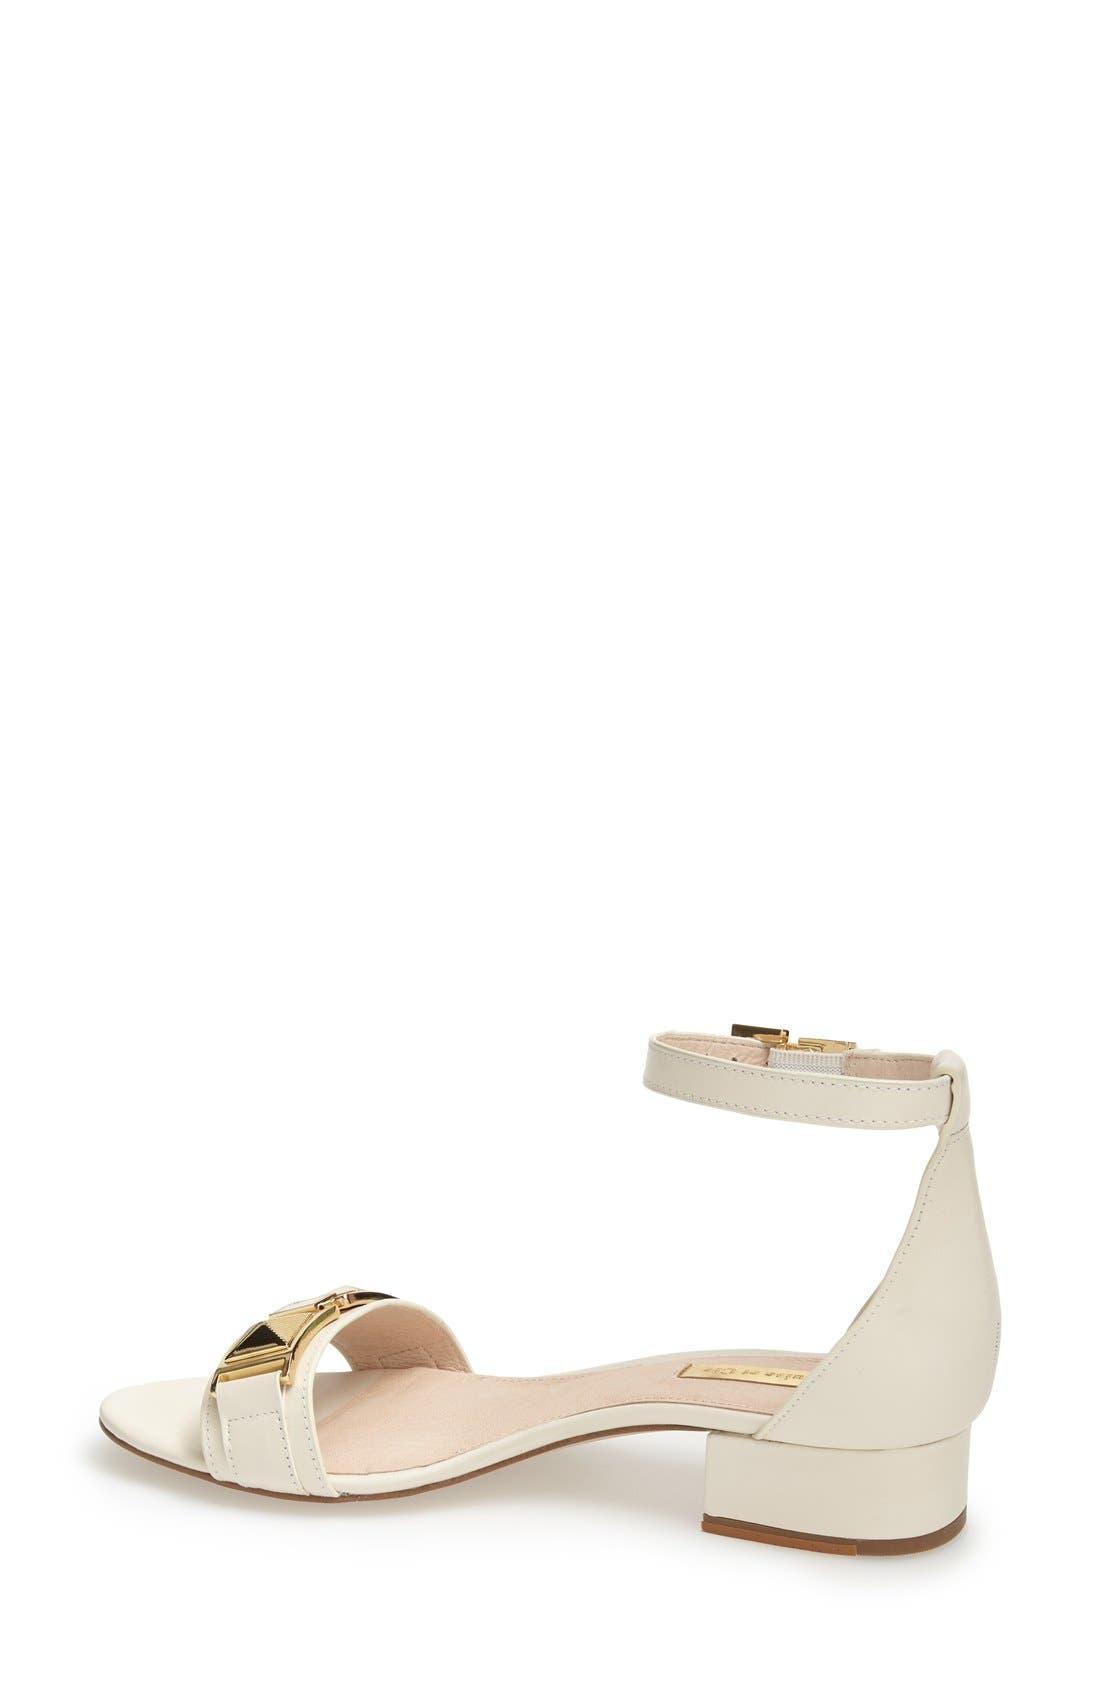 Alternate Image 2  - Louise et Cie 'Isabelle' Ankle Strap Sandal (Women)